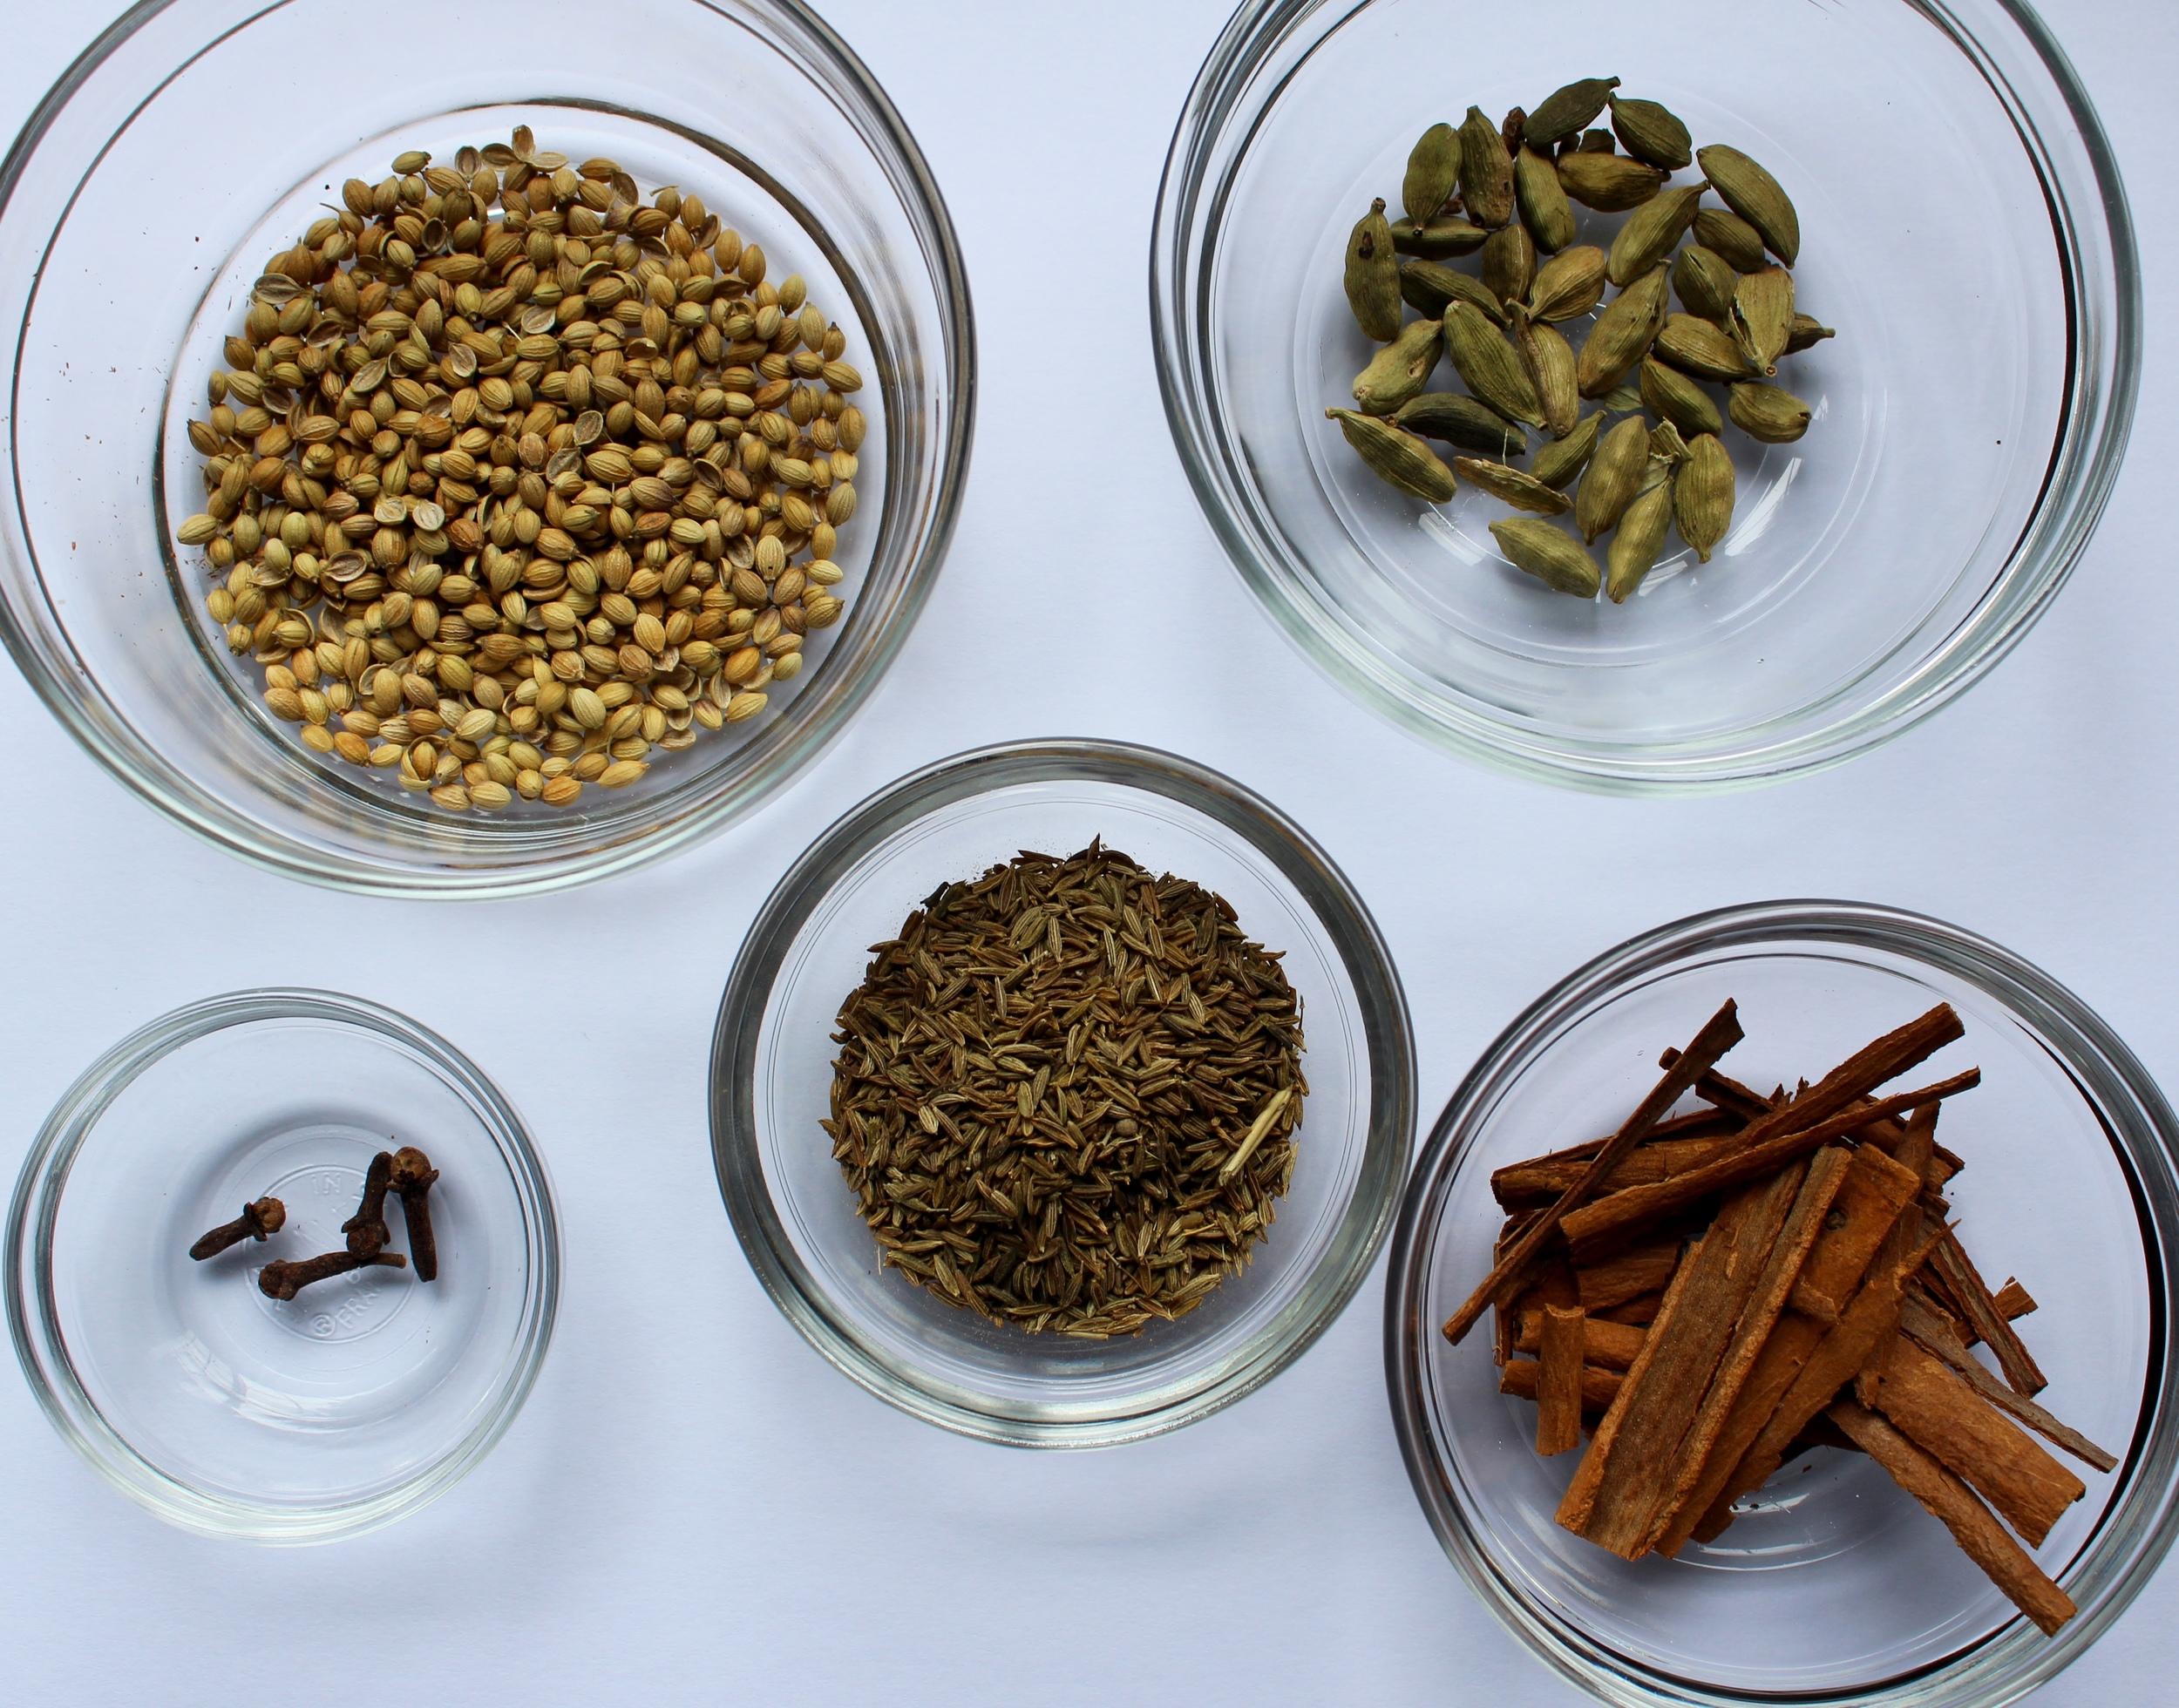 Spices: coriander seeds, cardamom pods, cumin seeds, whole cloves & cinnamon sticks